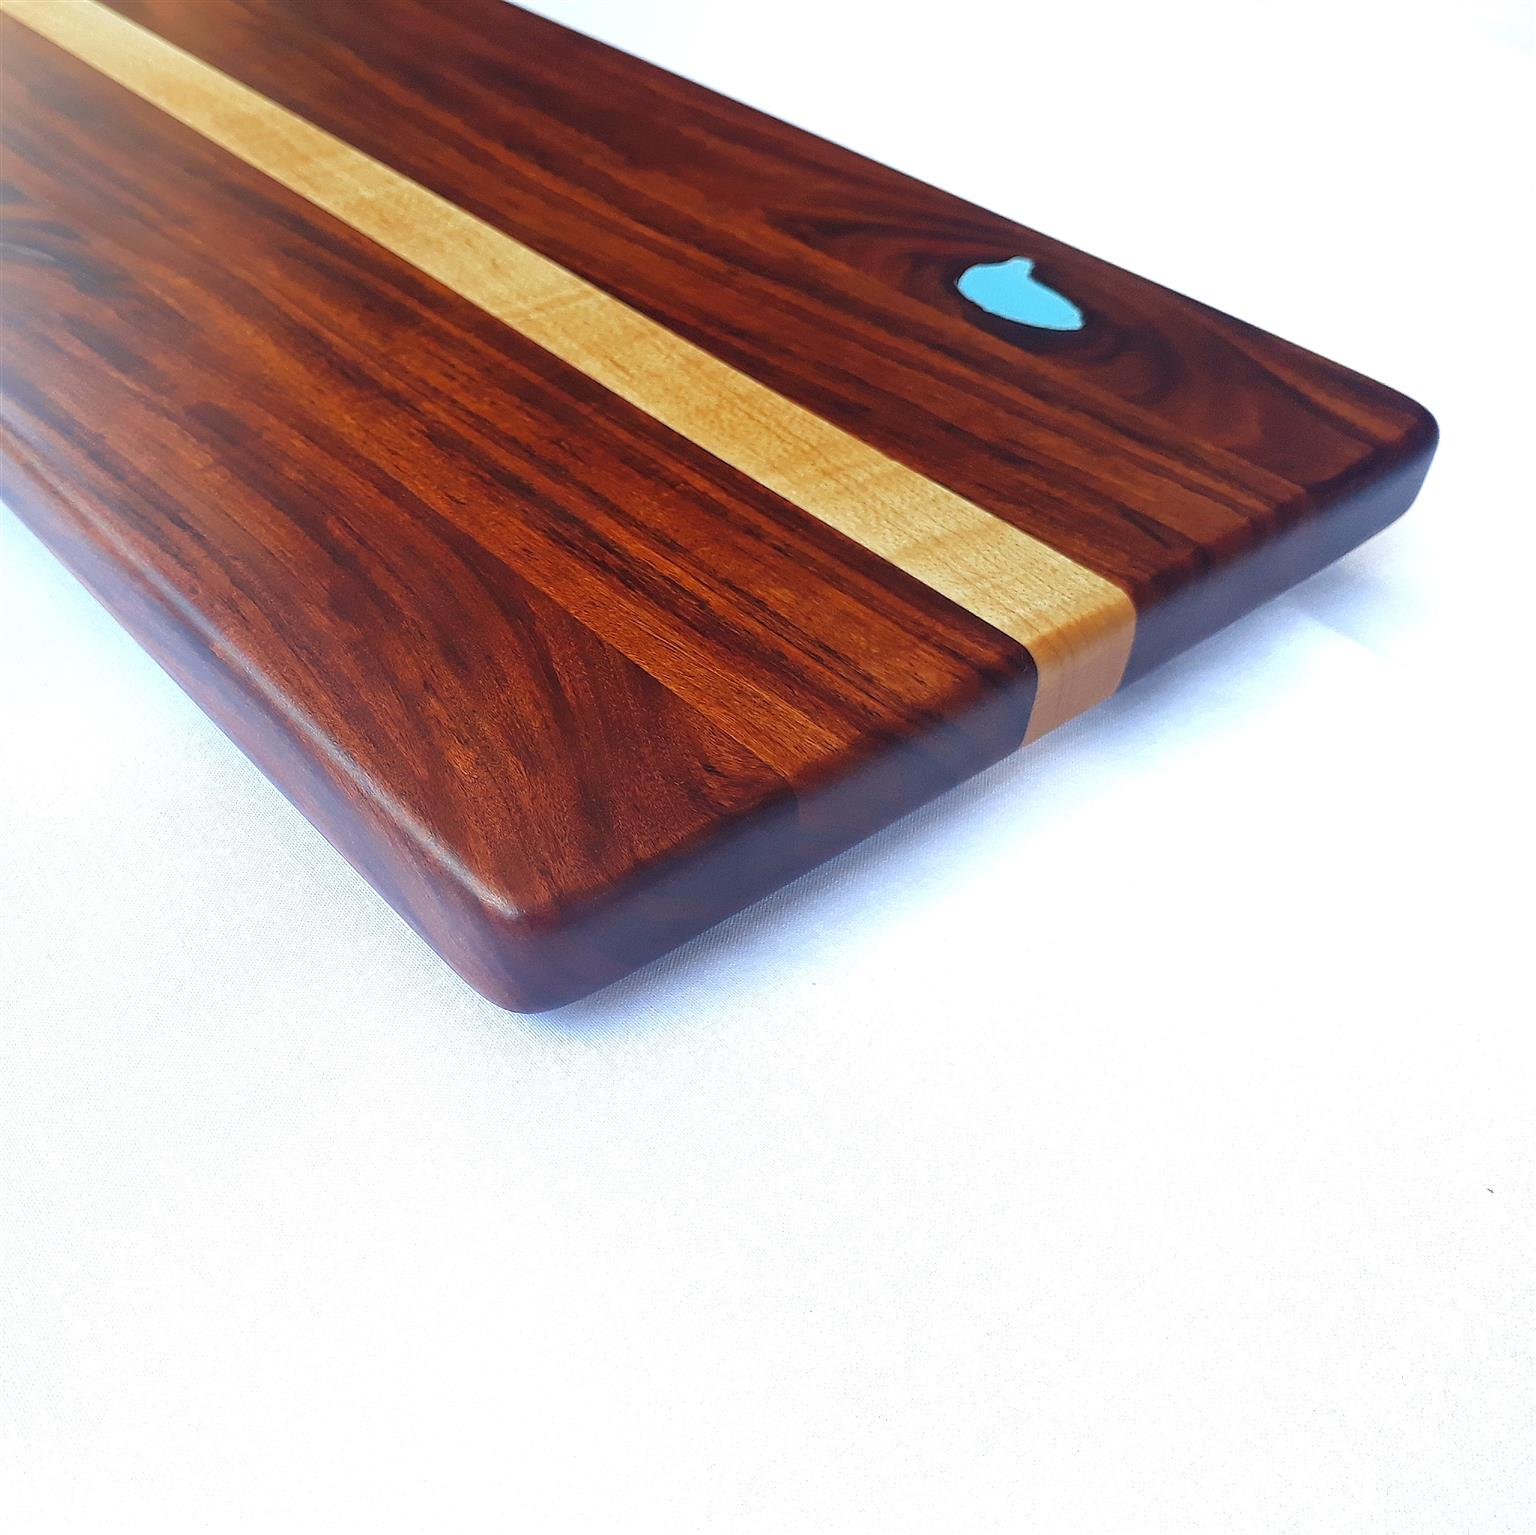 Rhodesian Teak & Maple Charcuterie Board (490mm L x 200mm W x 20mm H)